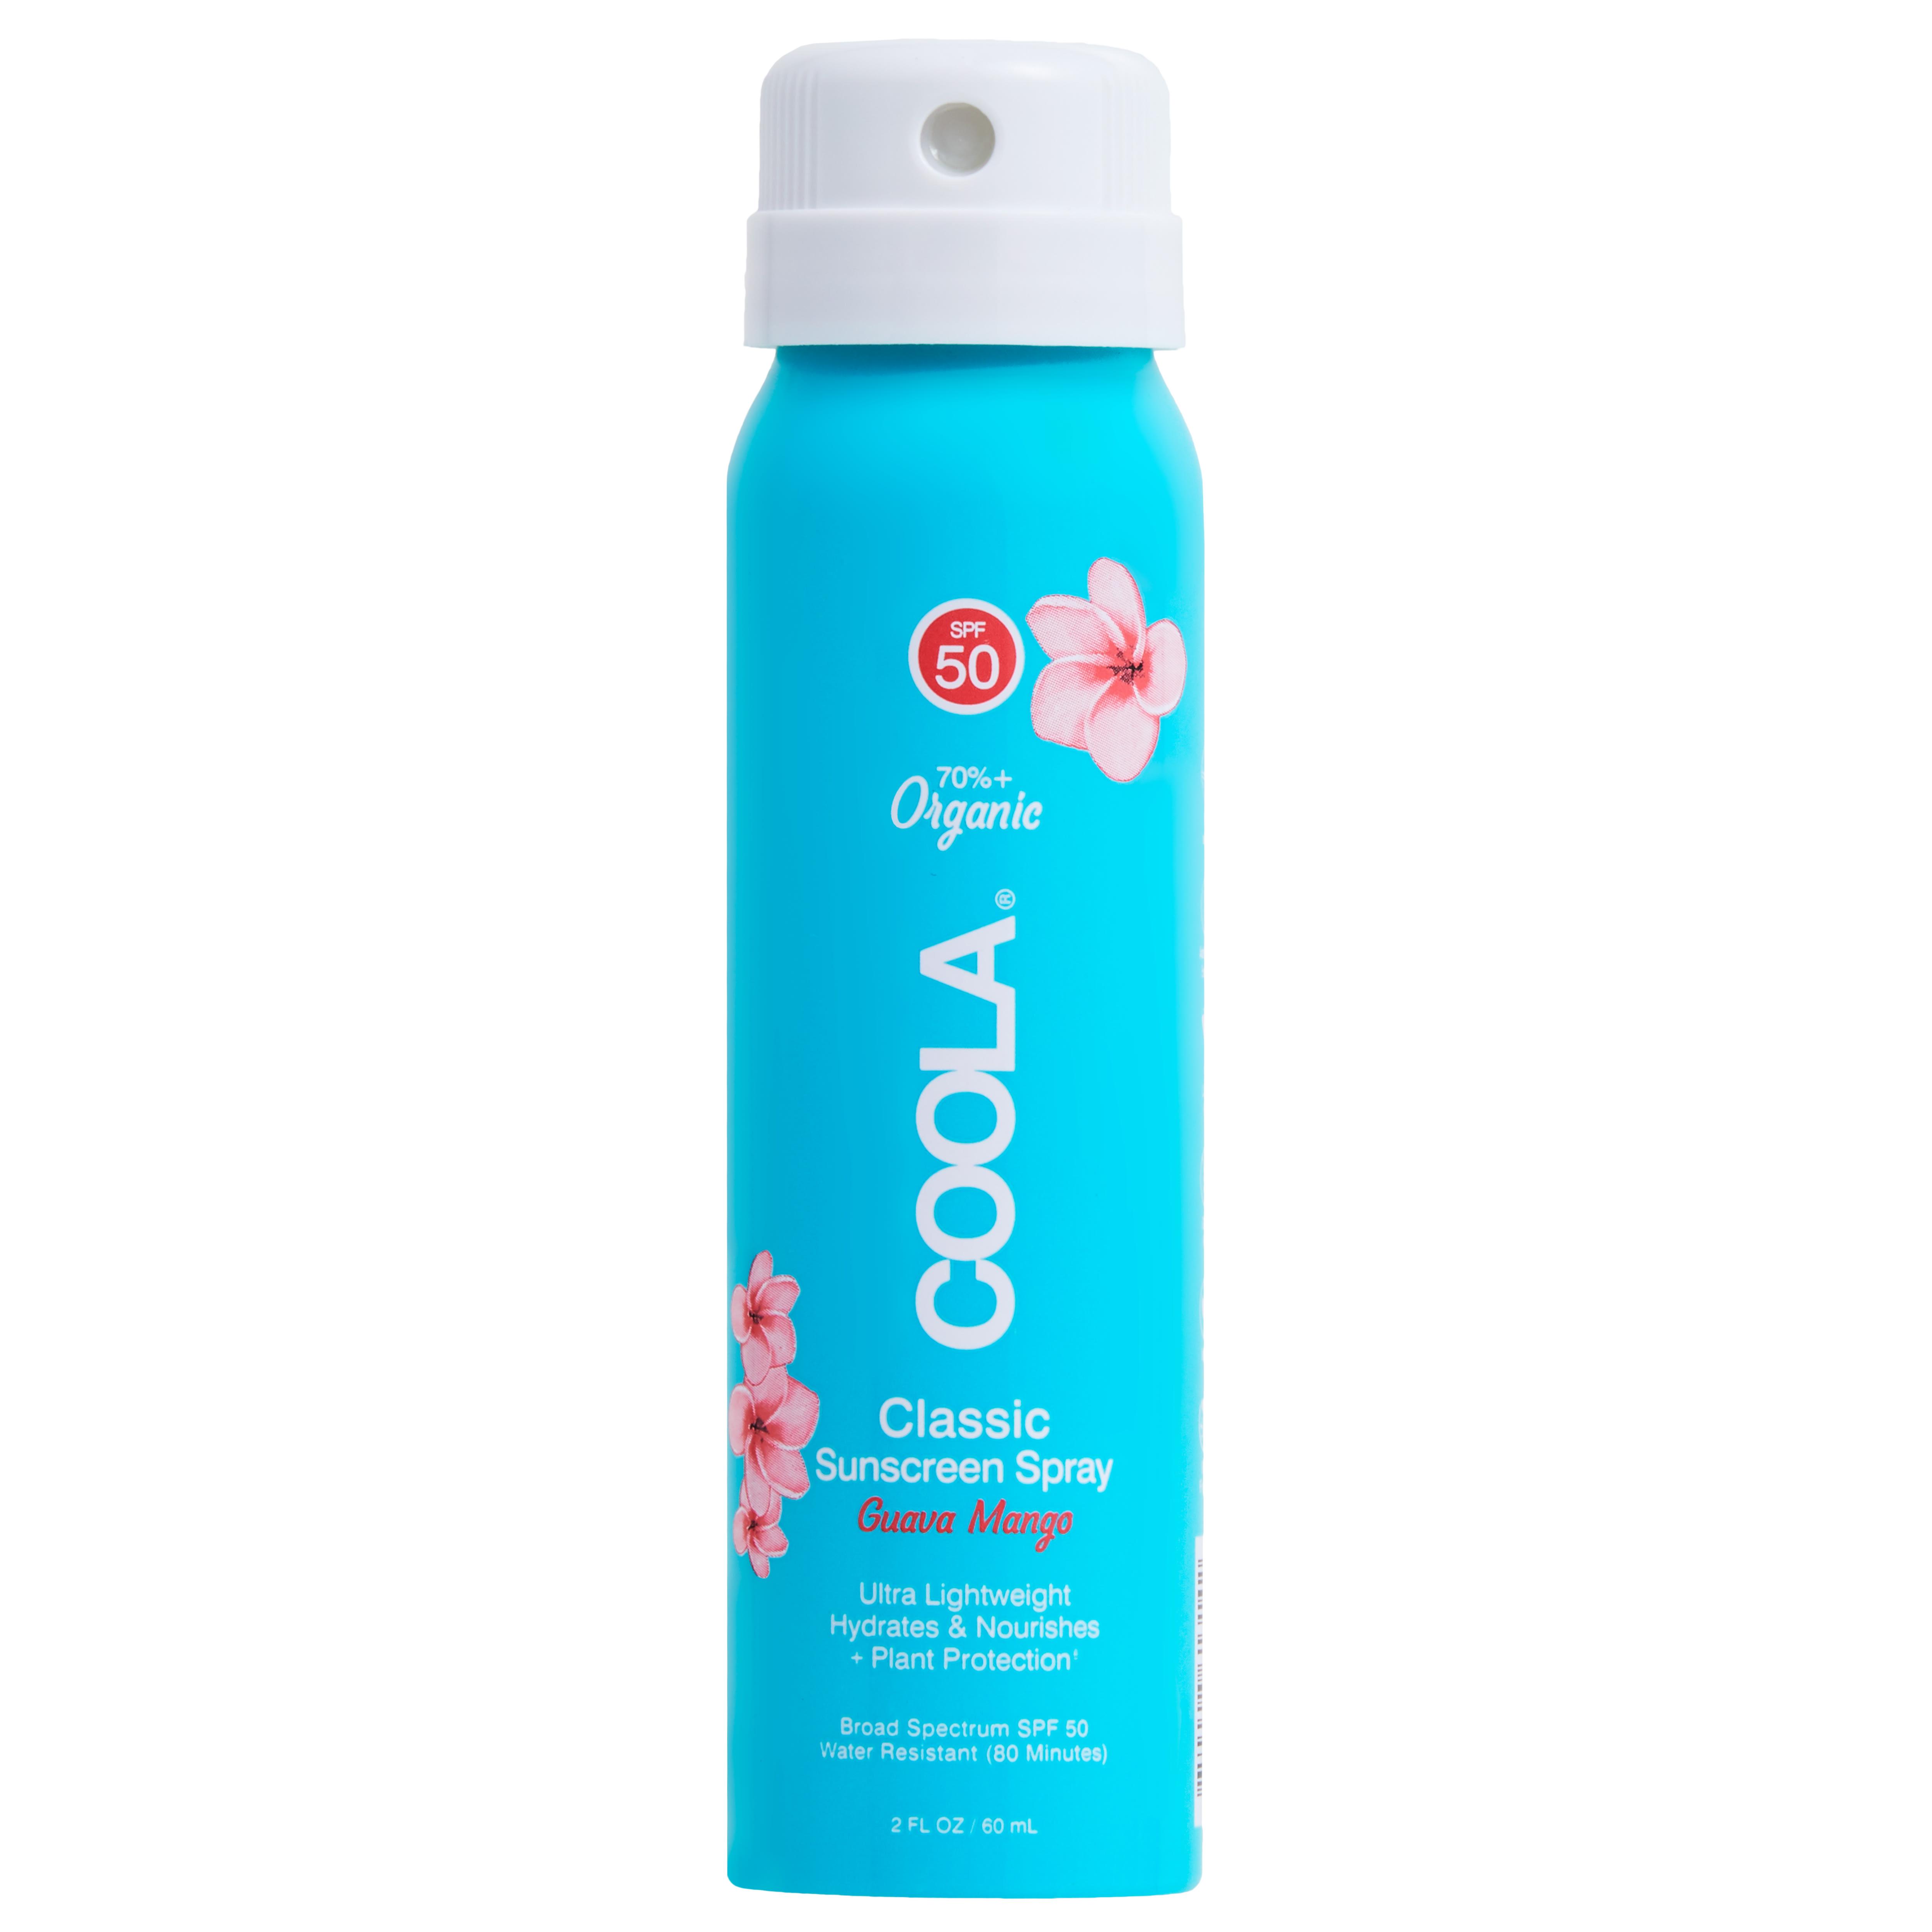 COOLA Classic Body Organic Sunscreen Spray SPF 50, Guava Mango - 2 fl oz